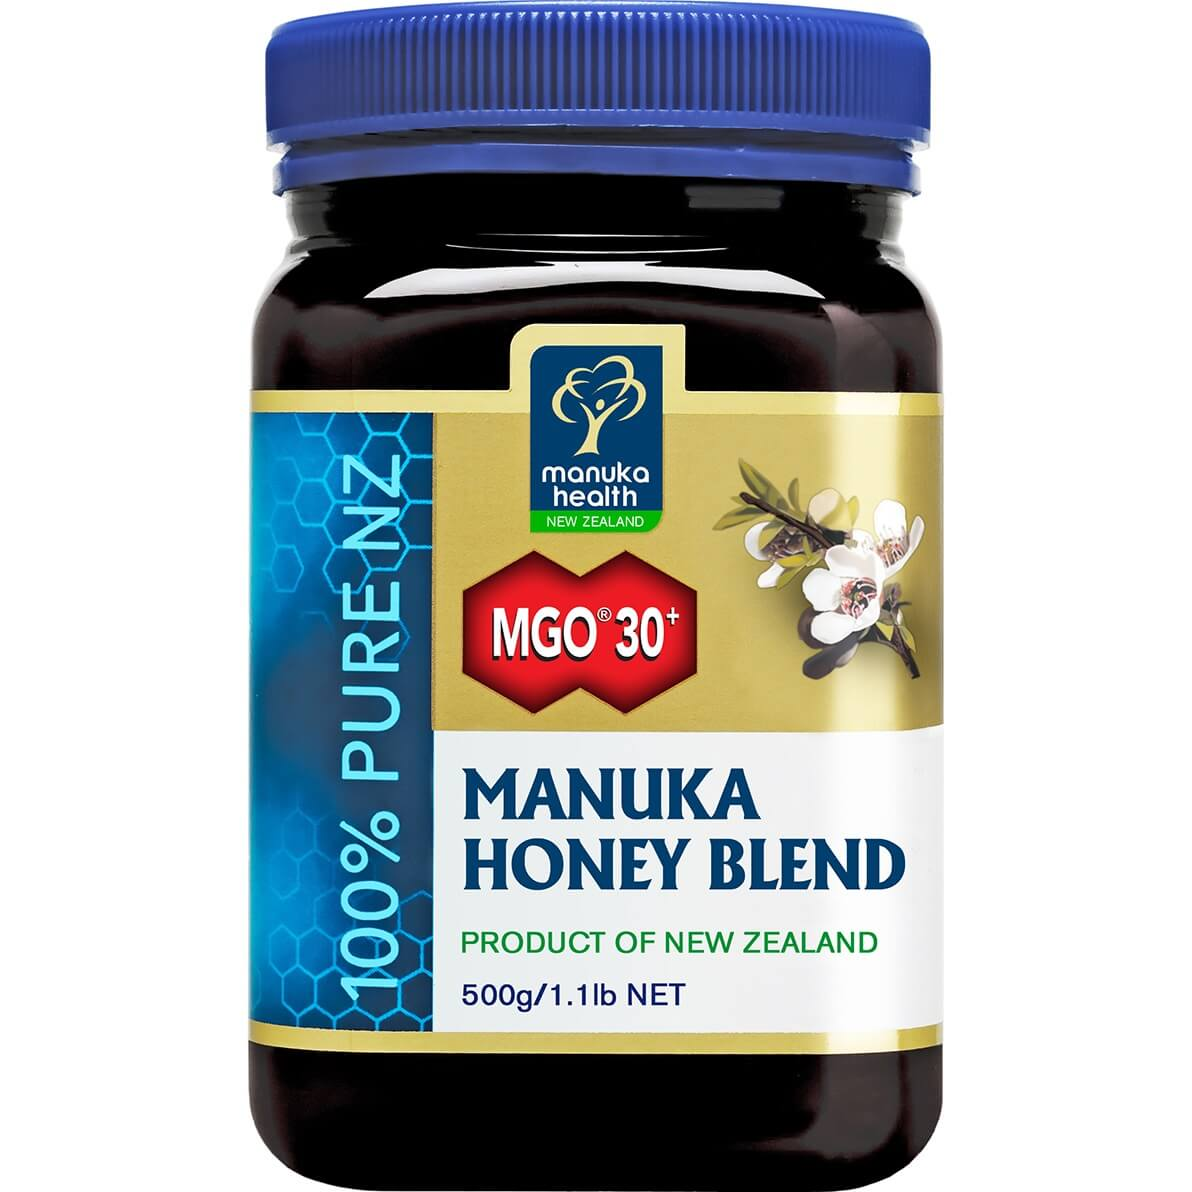 Manuca honey